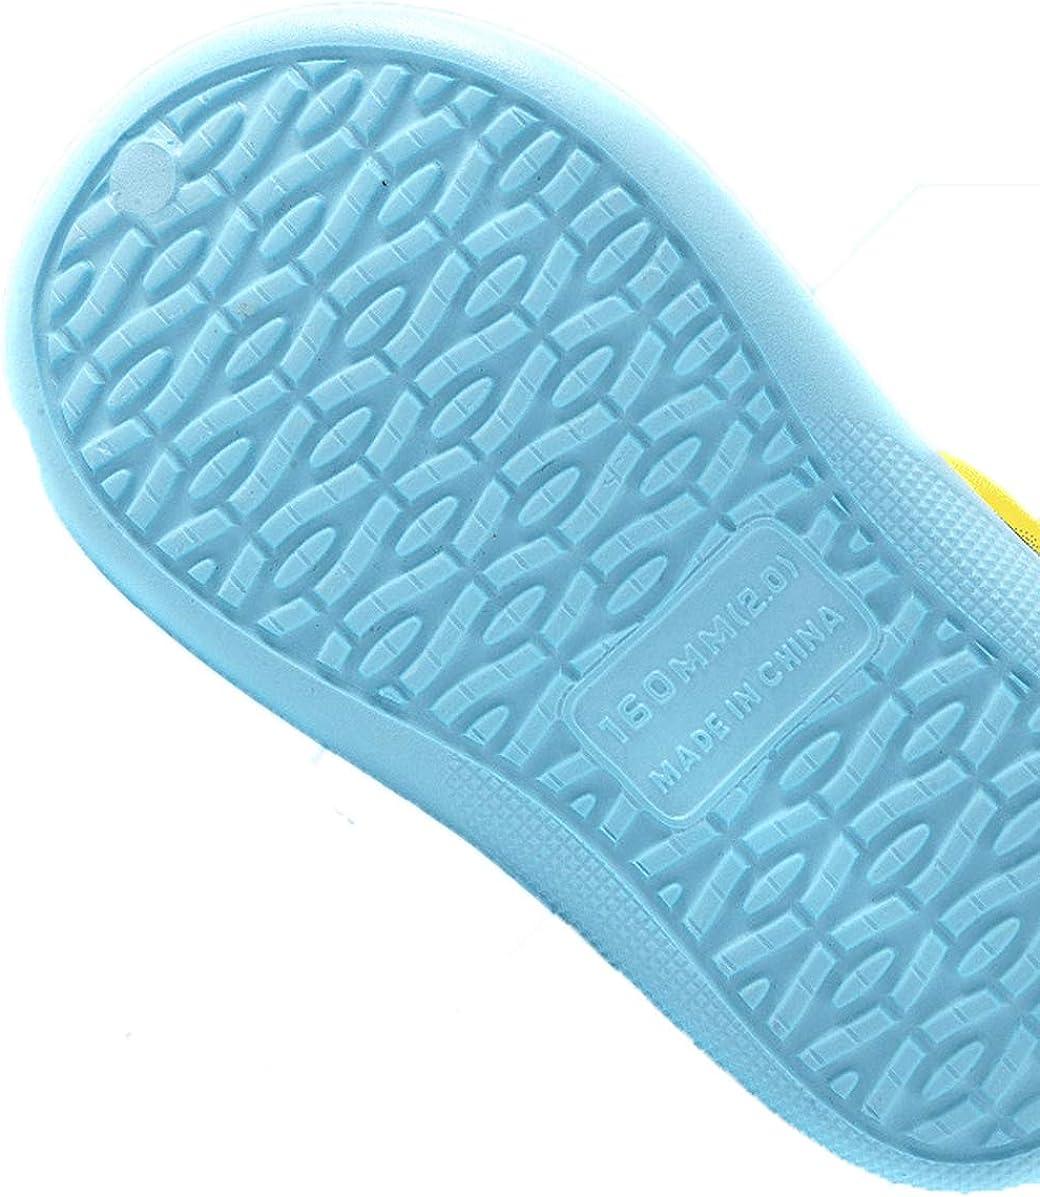 Unisex Zuecos para Infantil Verano Playa Respirable Antideslizante Sandalia Cerrada Duraderas Zapatillas Ni/ñas Ni/ños Tallas 22-27 EU